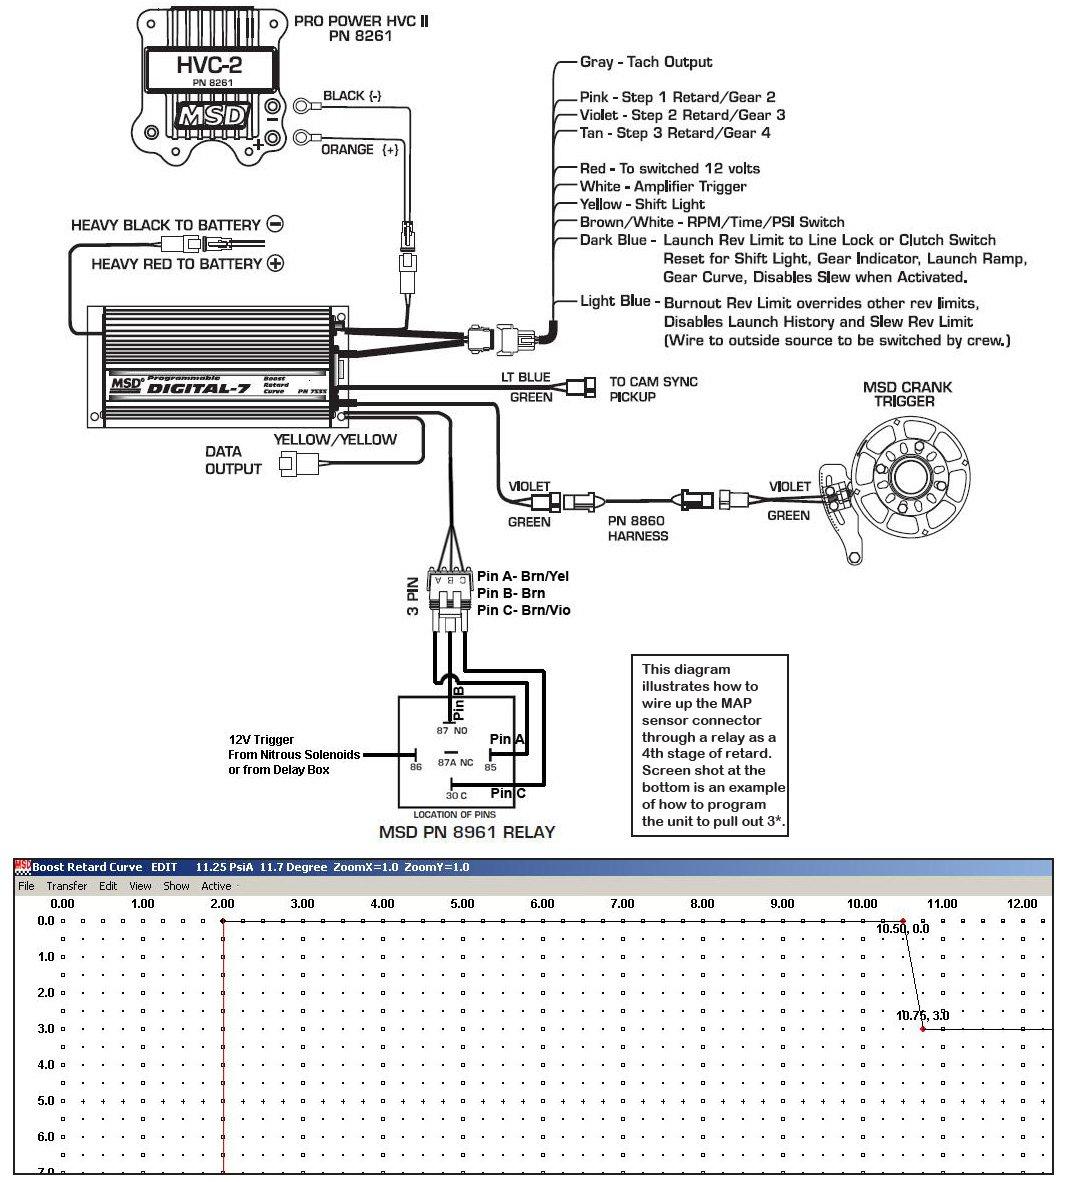 blog_diagrams_and_drawings_digital_7_drawings_7531_4th_stage_retard_map_4th_stage_retard_reva?resize\=665%2C738\&ssl\=1 msd 7al 2 wiring diagram chevy ignition msd 7al2 for sale \u2022 45 63 msd 7al-2 wiring diagram 7220 at creativeand.co